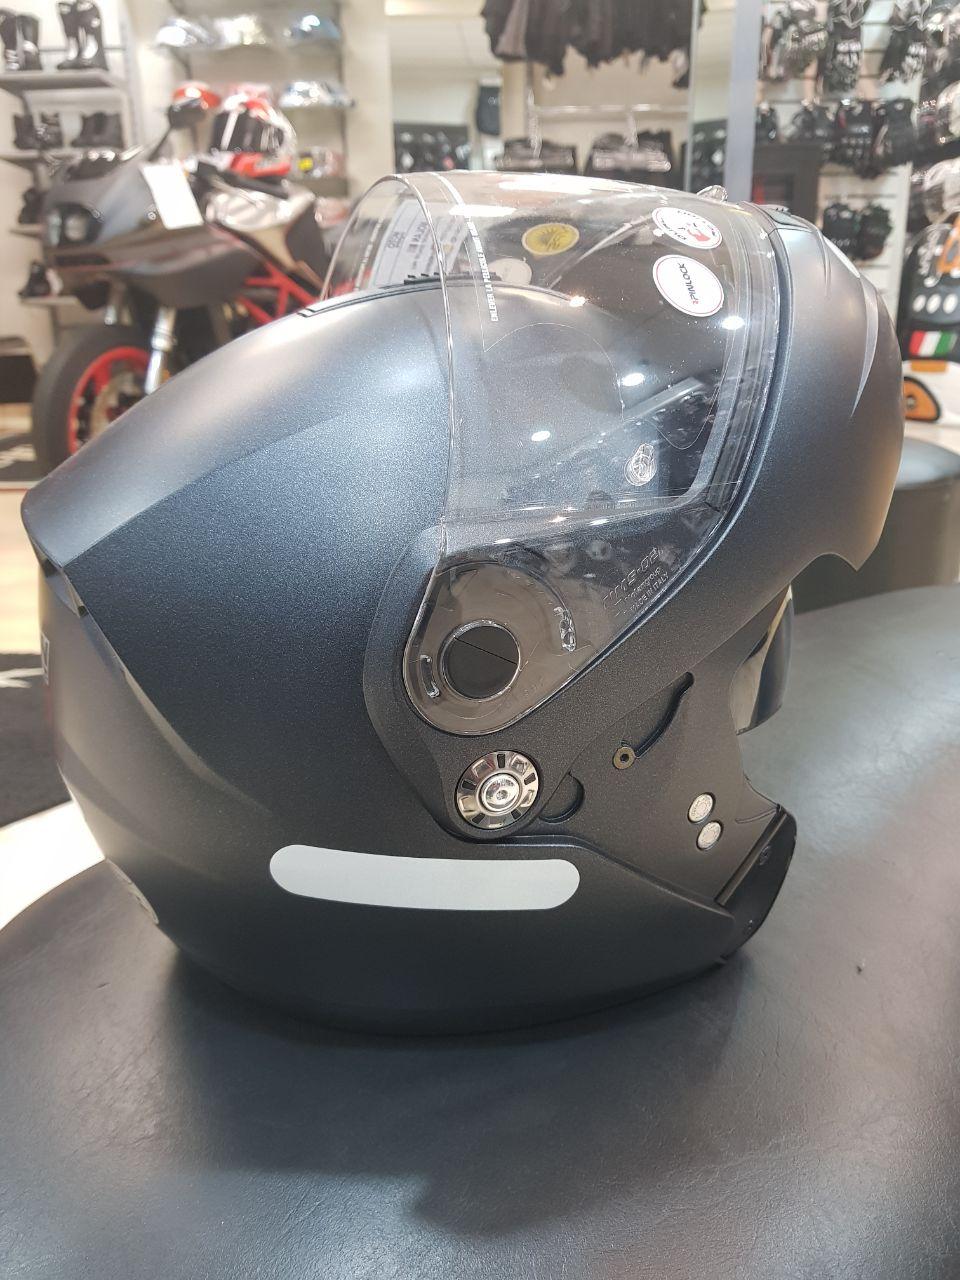 Capacete Nolan N91 Special Black Graphite - Escamoteável com Viseira interna escura   - Nova Centro Boutique Roupas para Motociclistas